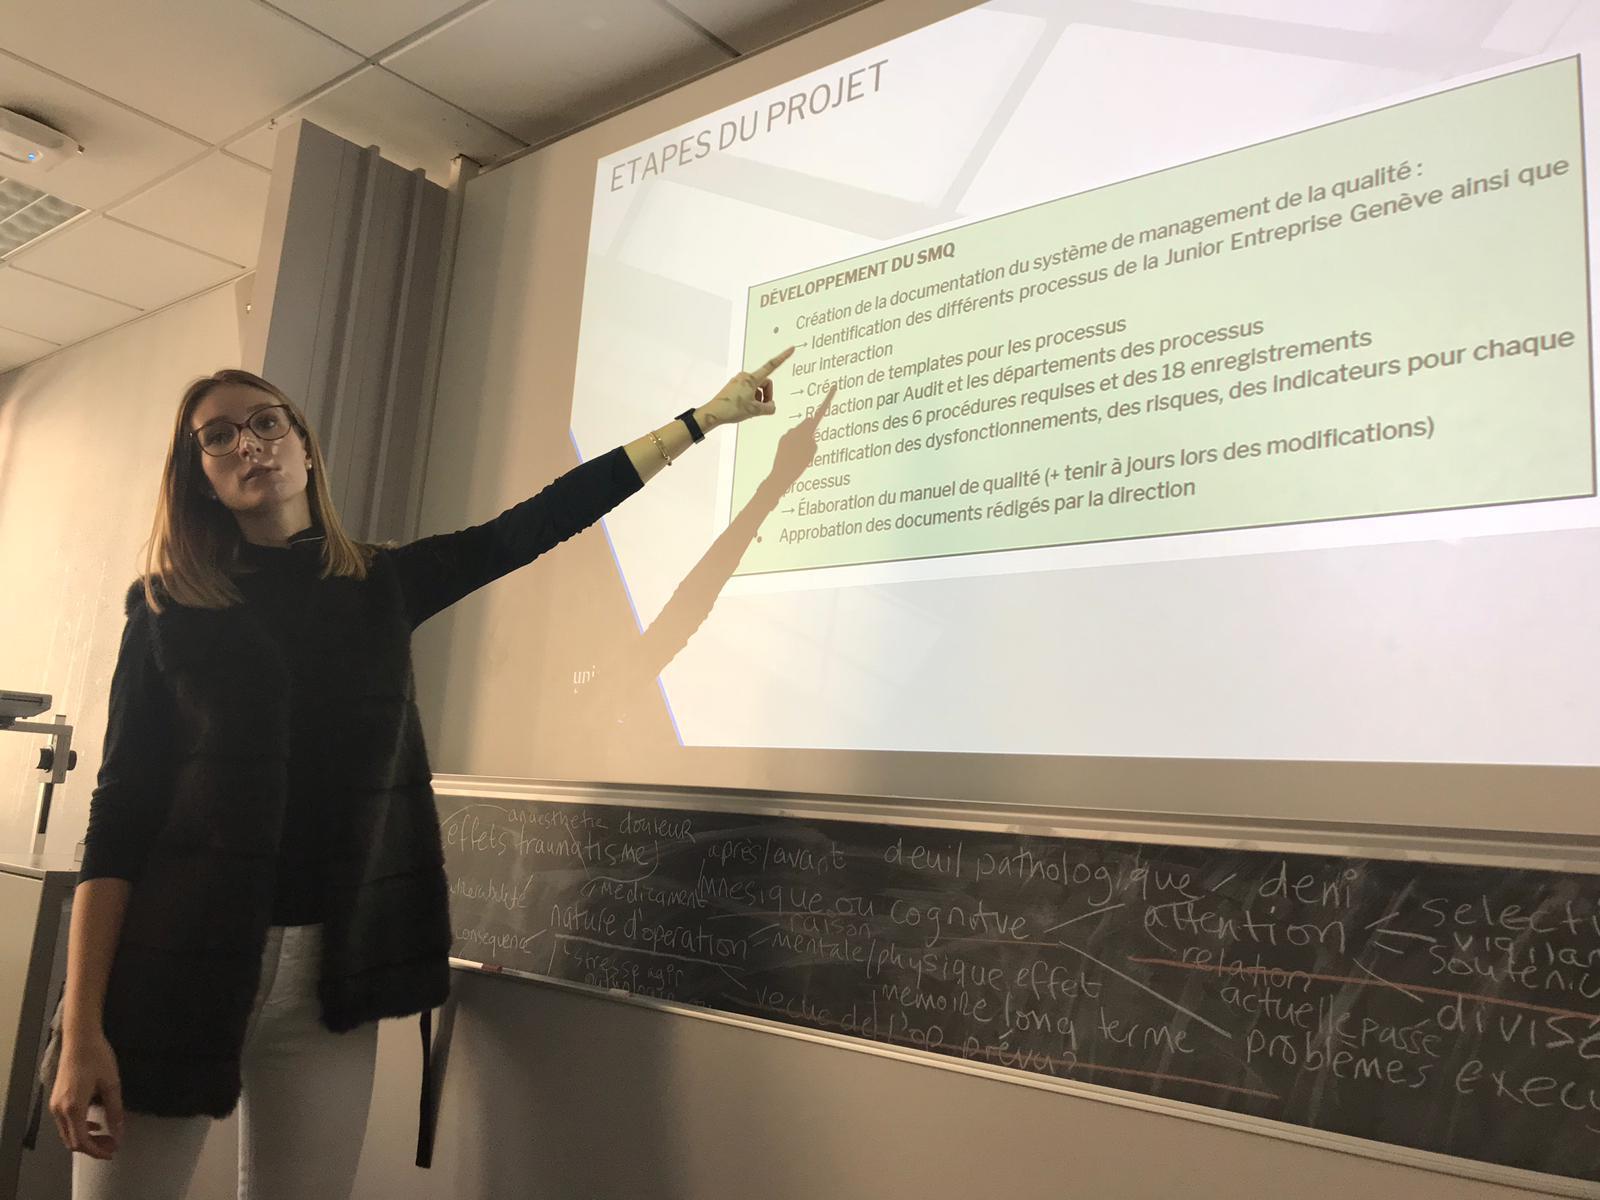 Junior entreprise Genève : alumni